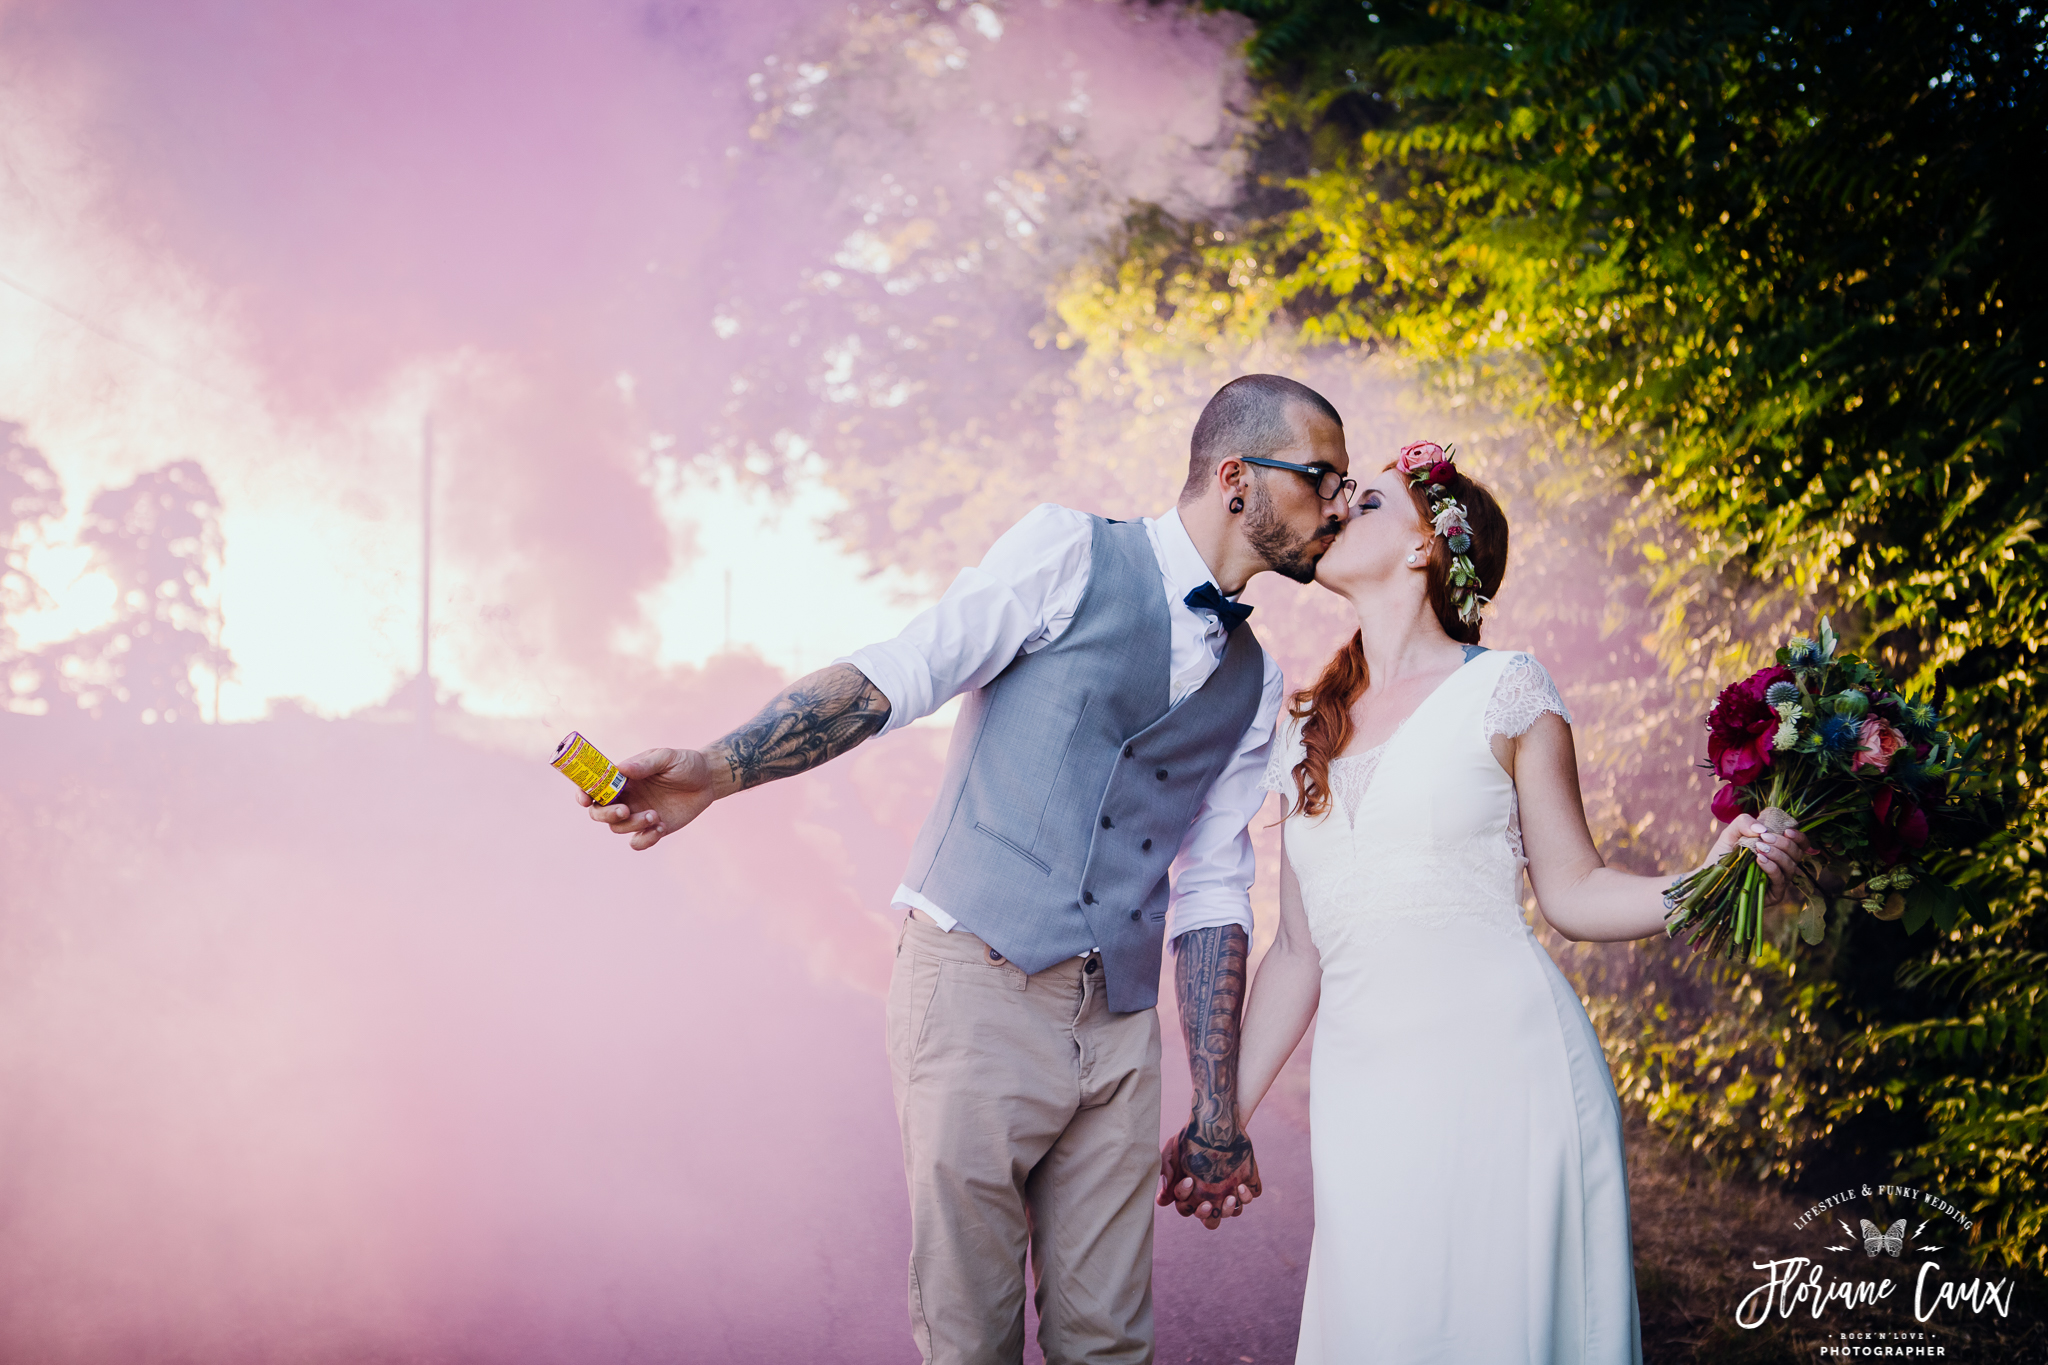 photographe-mariage-toulouse-rocknroll-maries-tatoues-floriane-caux-67